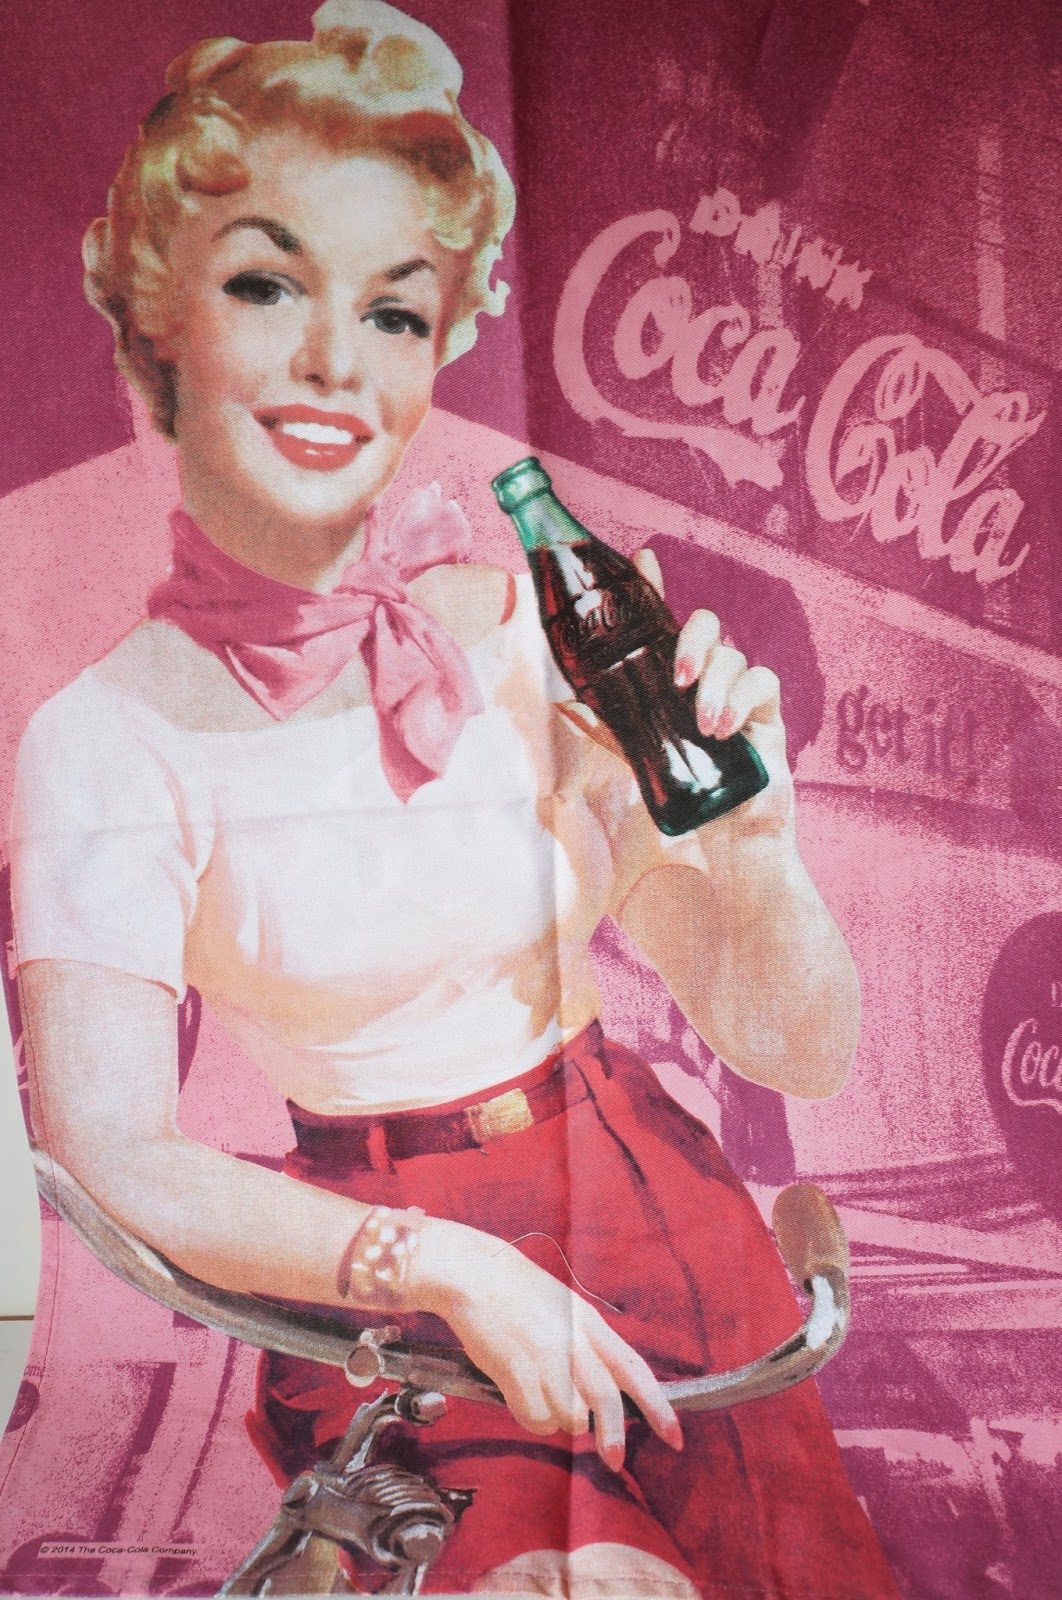 Pano de prato Coca-Cola retrô - loja Dellabino